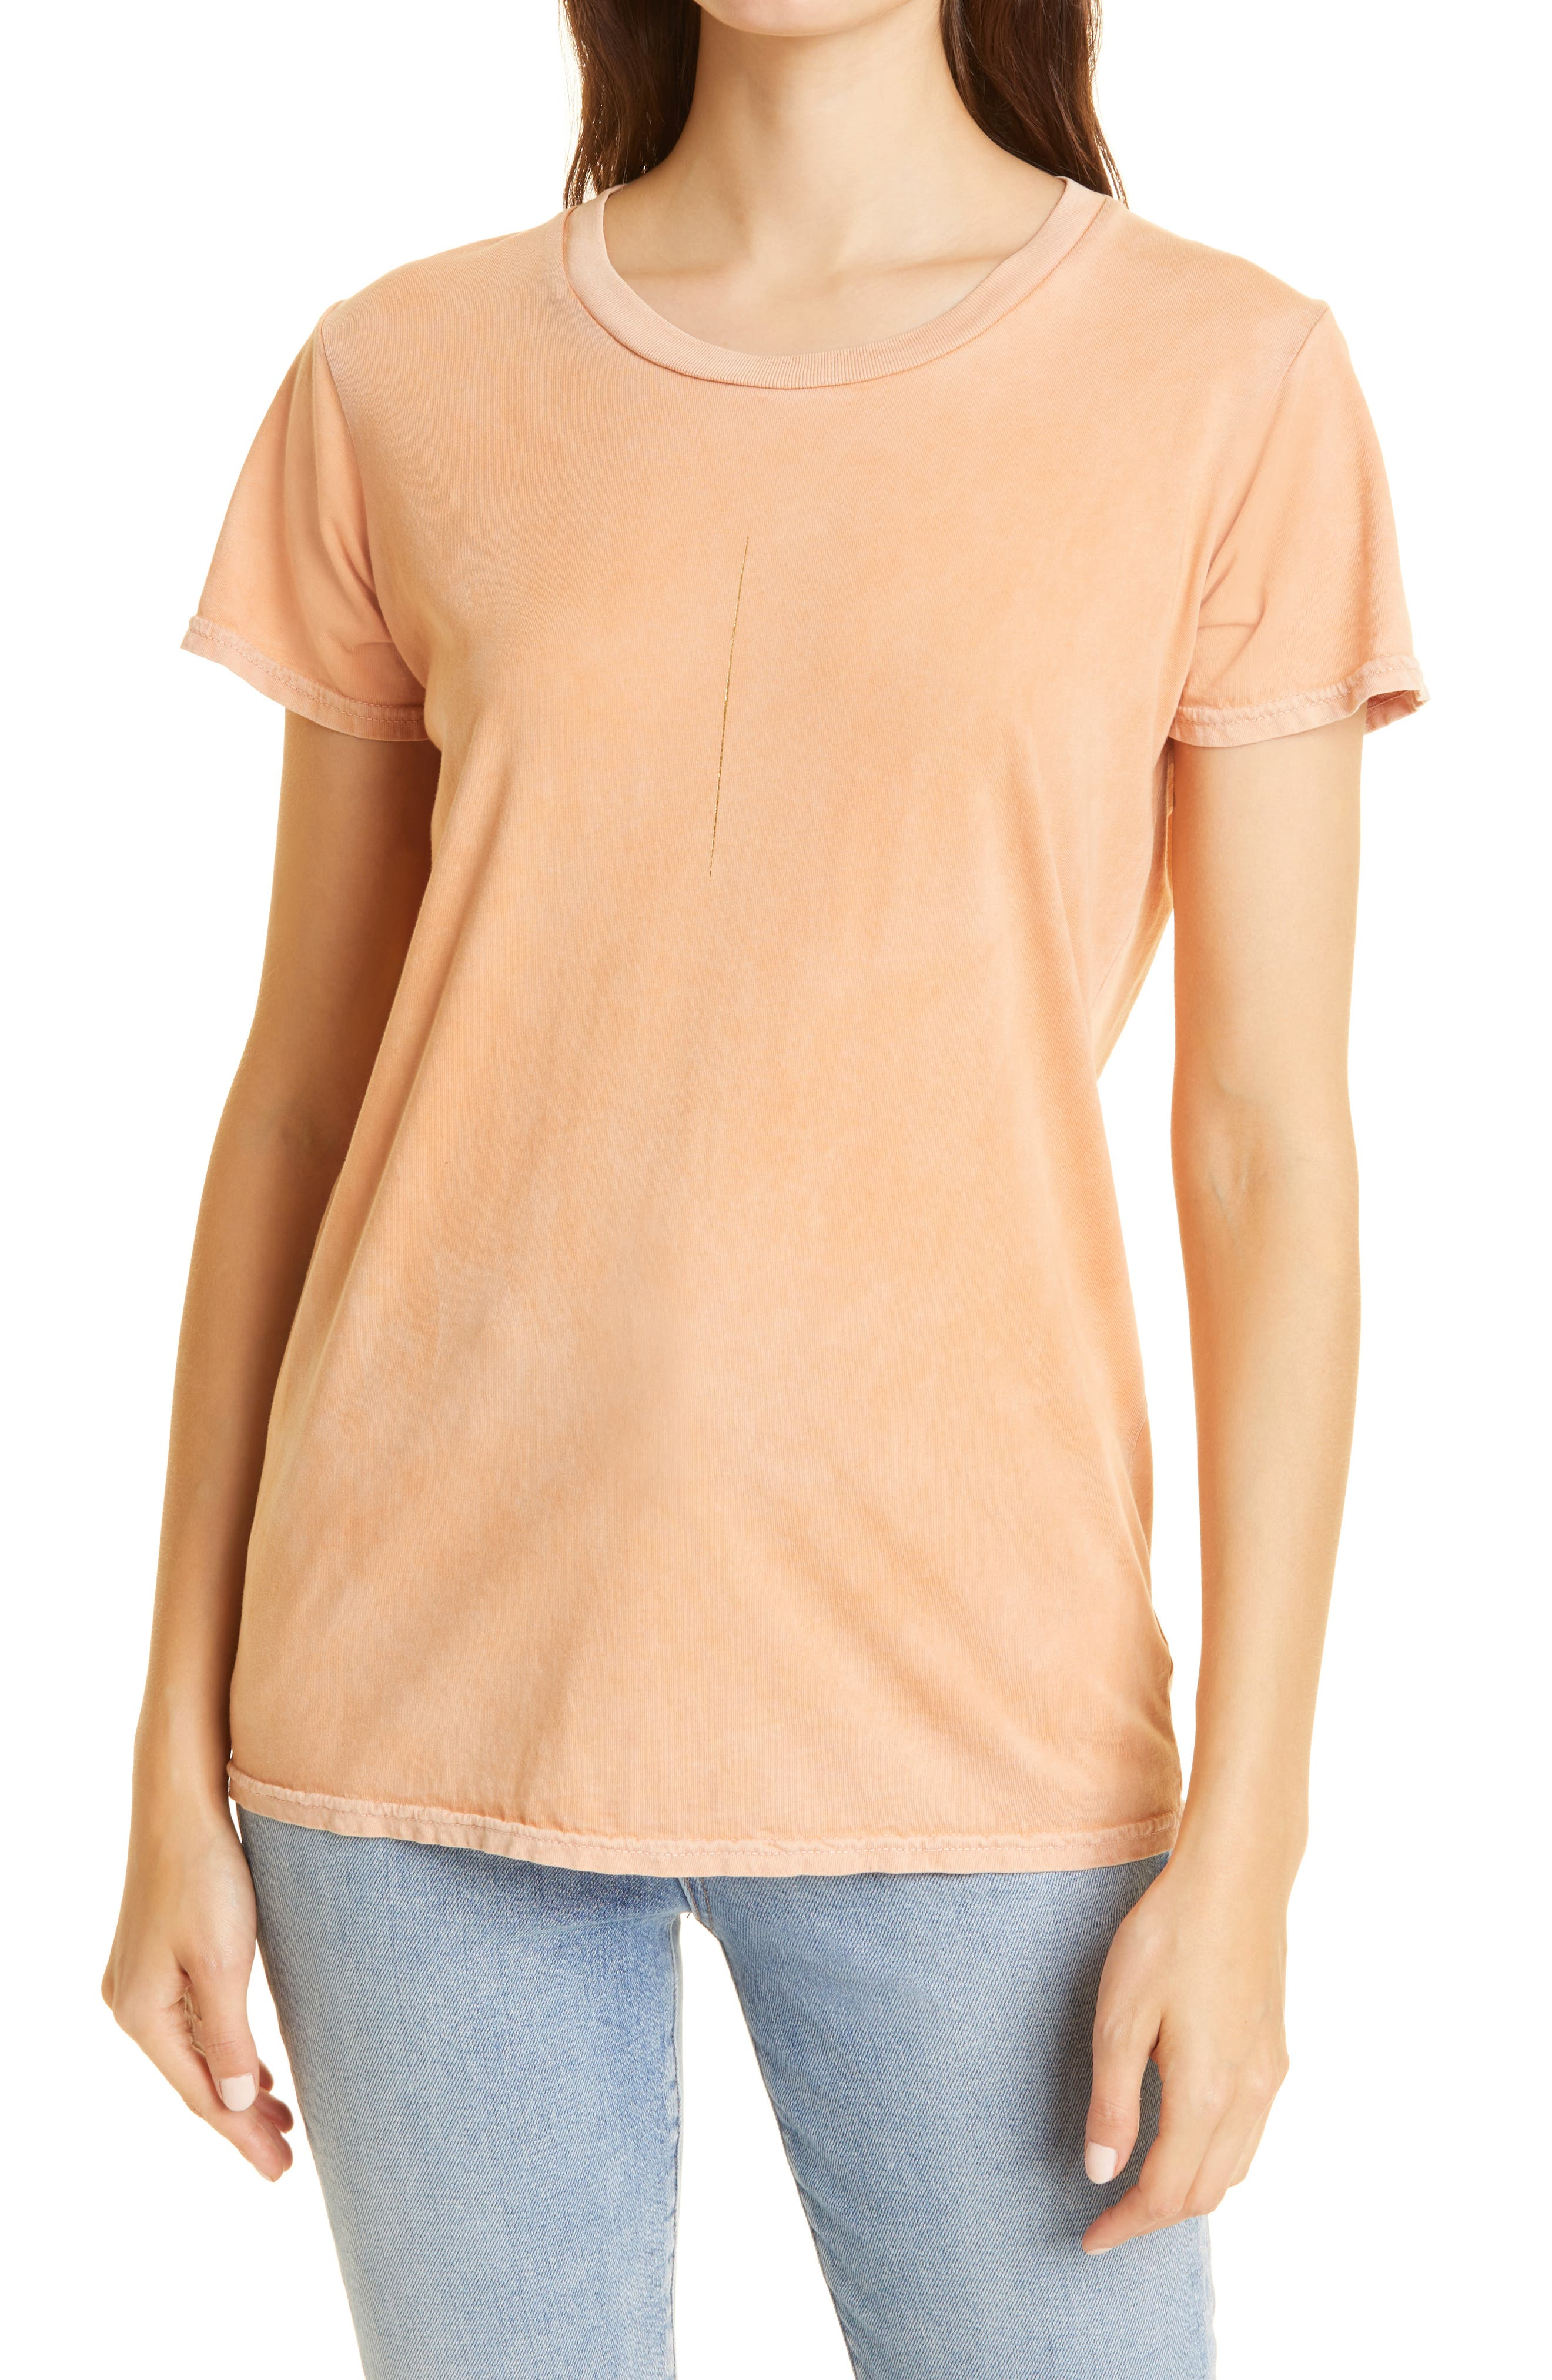 Goldenline Cotton T-Shirt